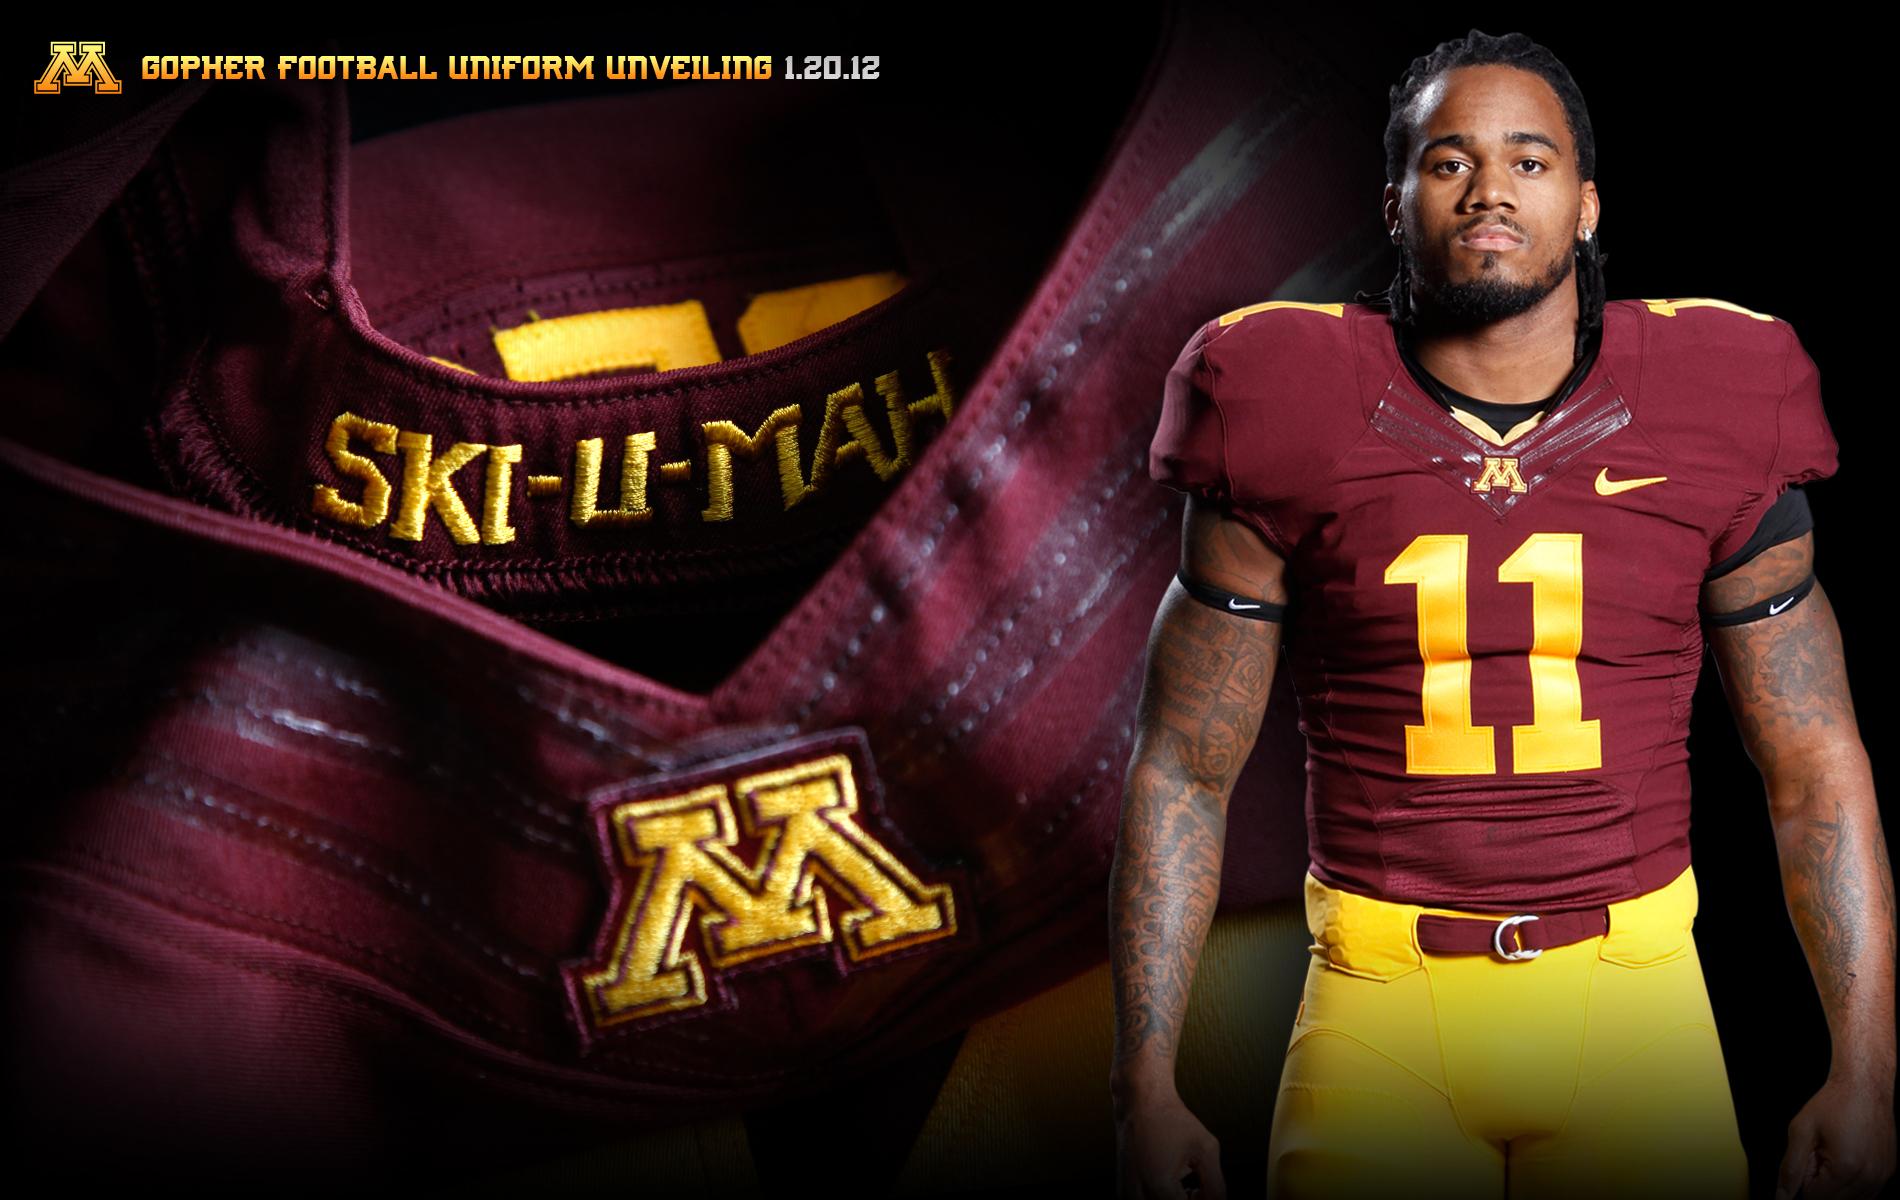 Mankato State Football >> University of Minnesota Wallpaper - WallpaperSafari